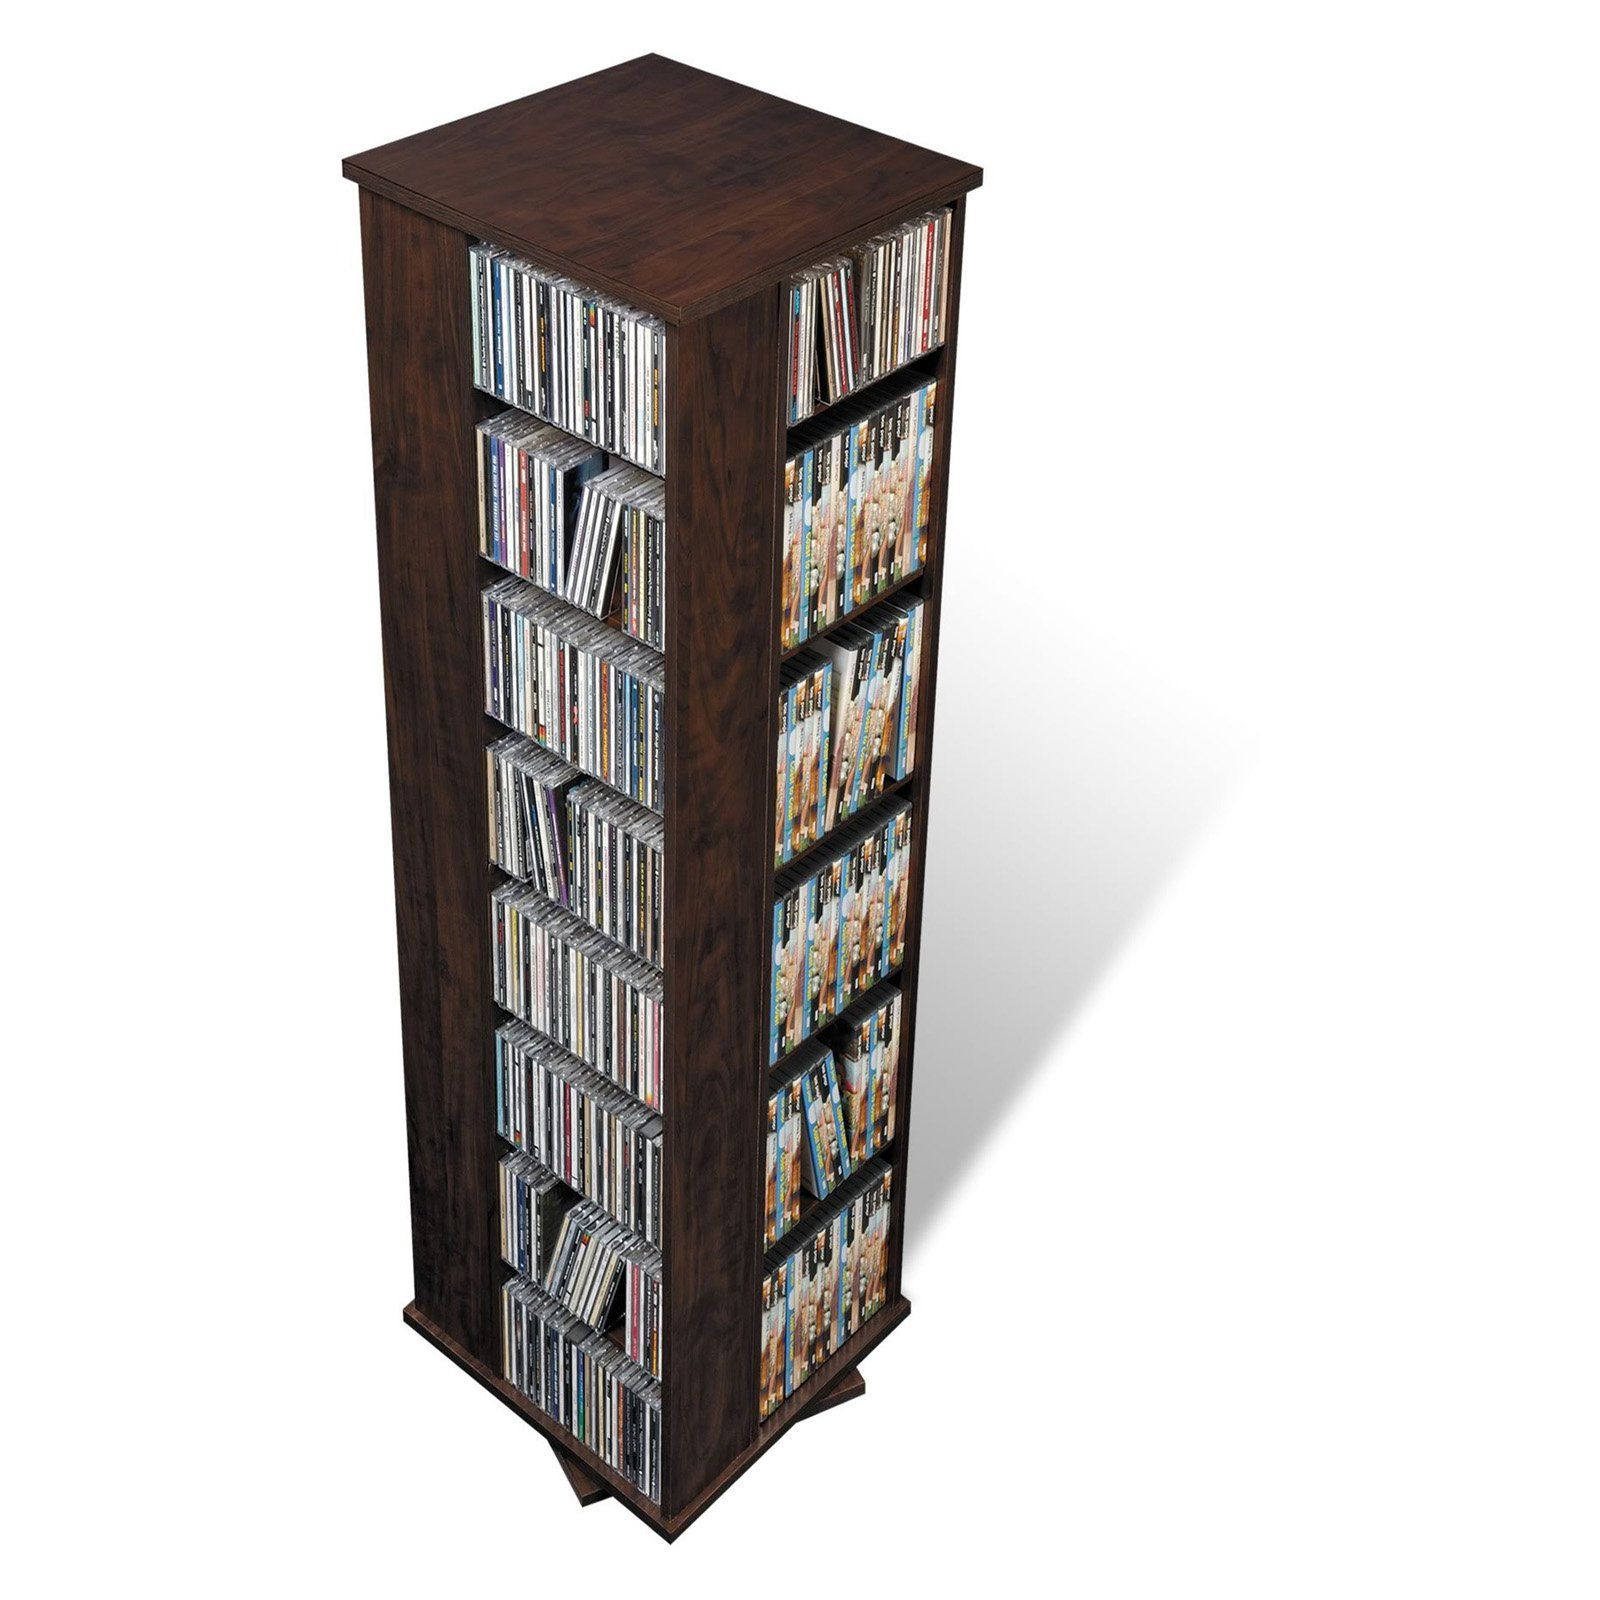 Prepac Large 4 Sided Spinning Tower Media Storage Espresso